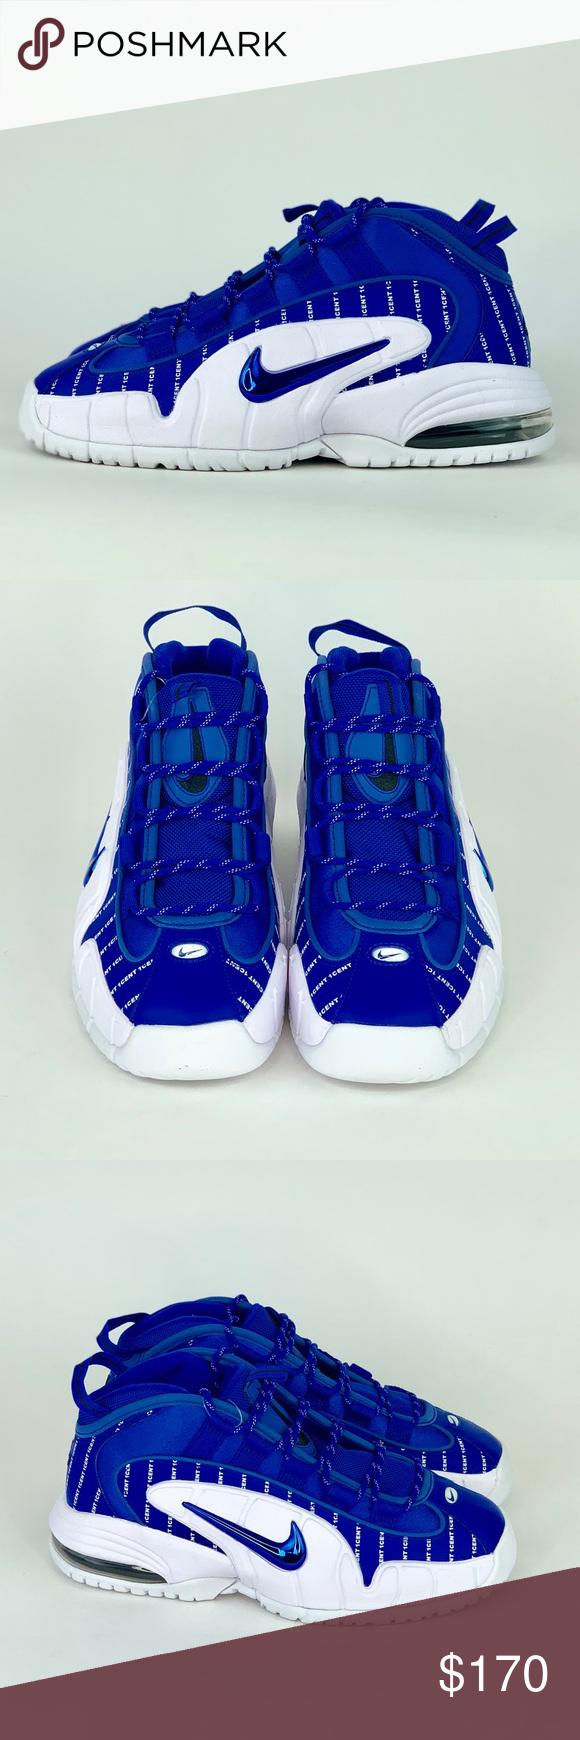 Nike Air Max Penny 1 'Pinstripe' Sz 7 Brand New Nike Air Max